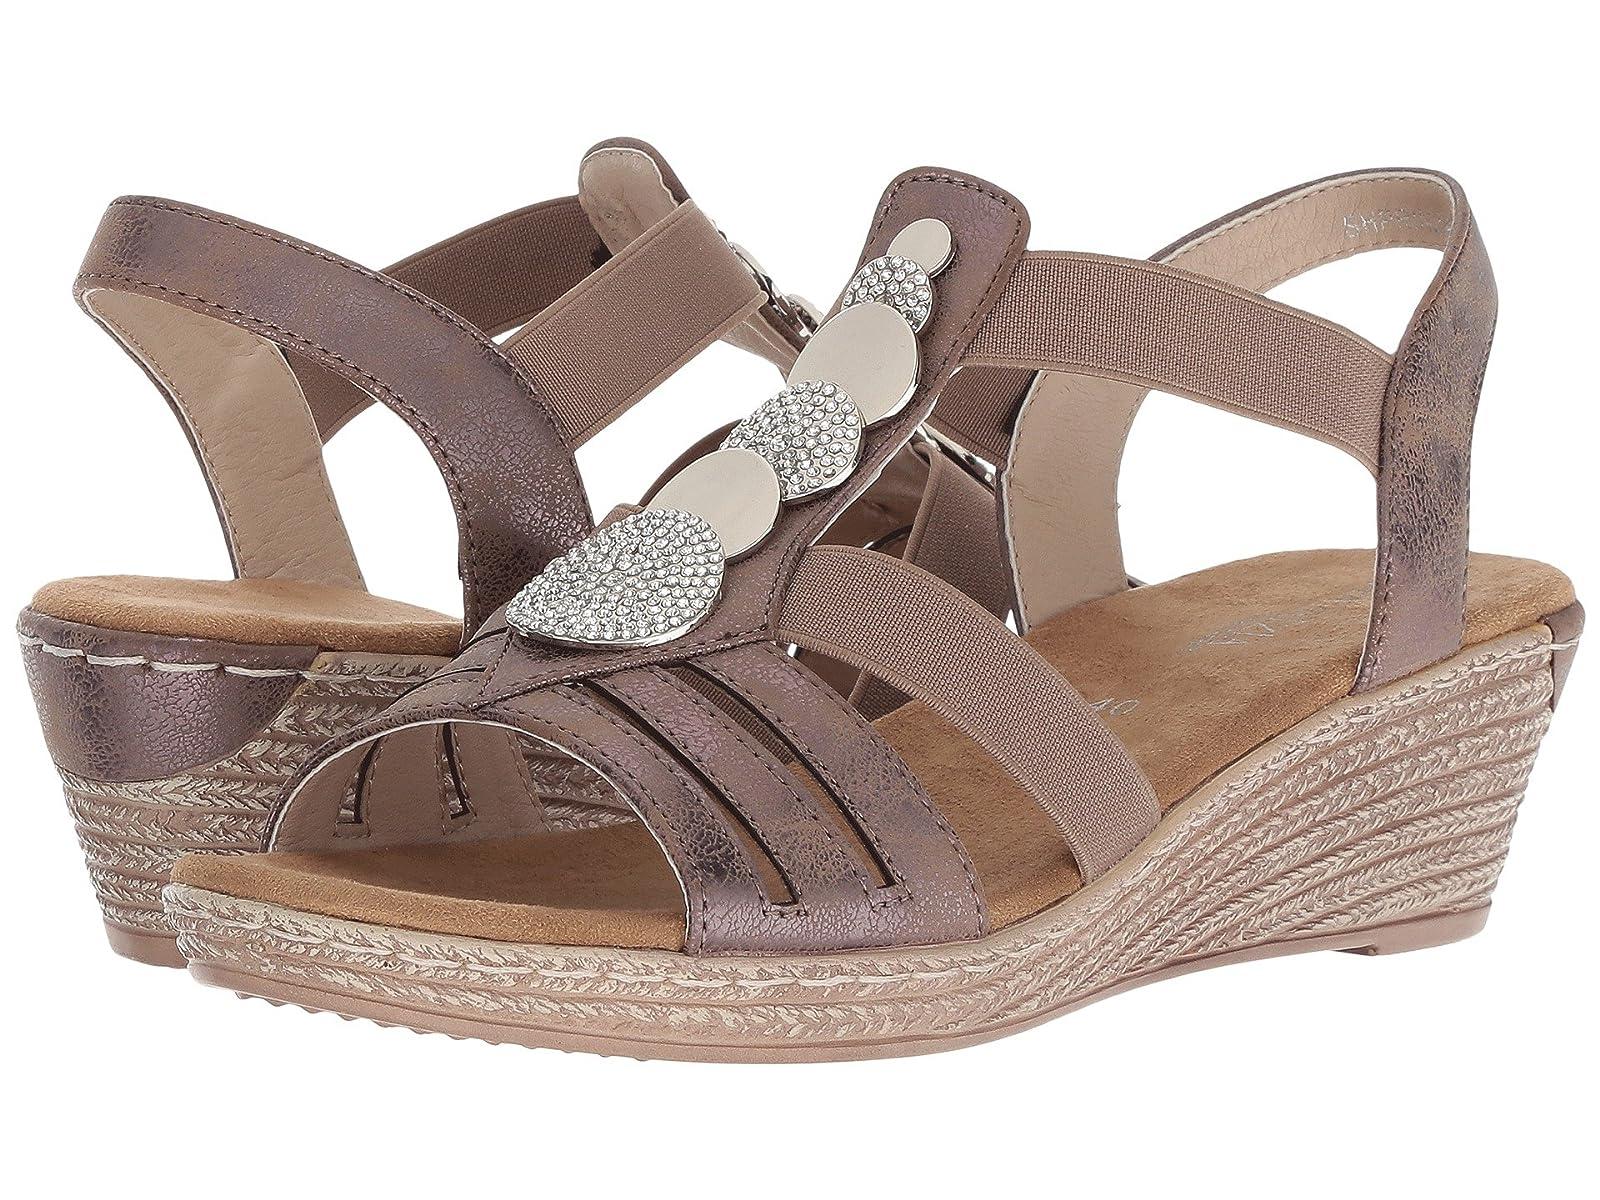 PATRIZIA Shprinza Wedge SandalCheap and distinctive eye-catching shoes